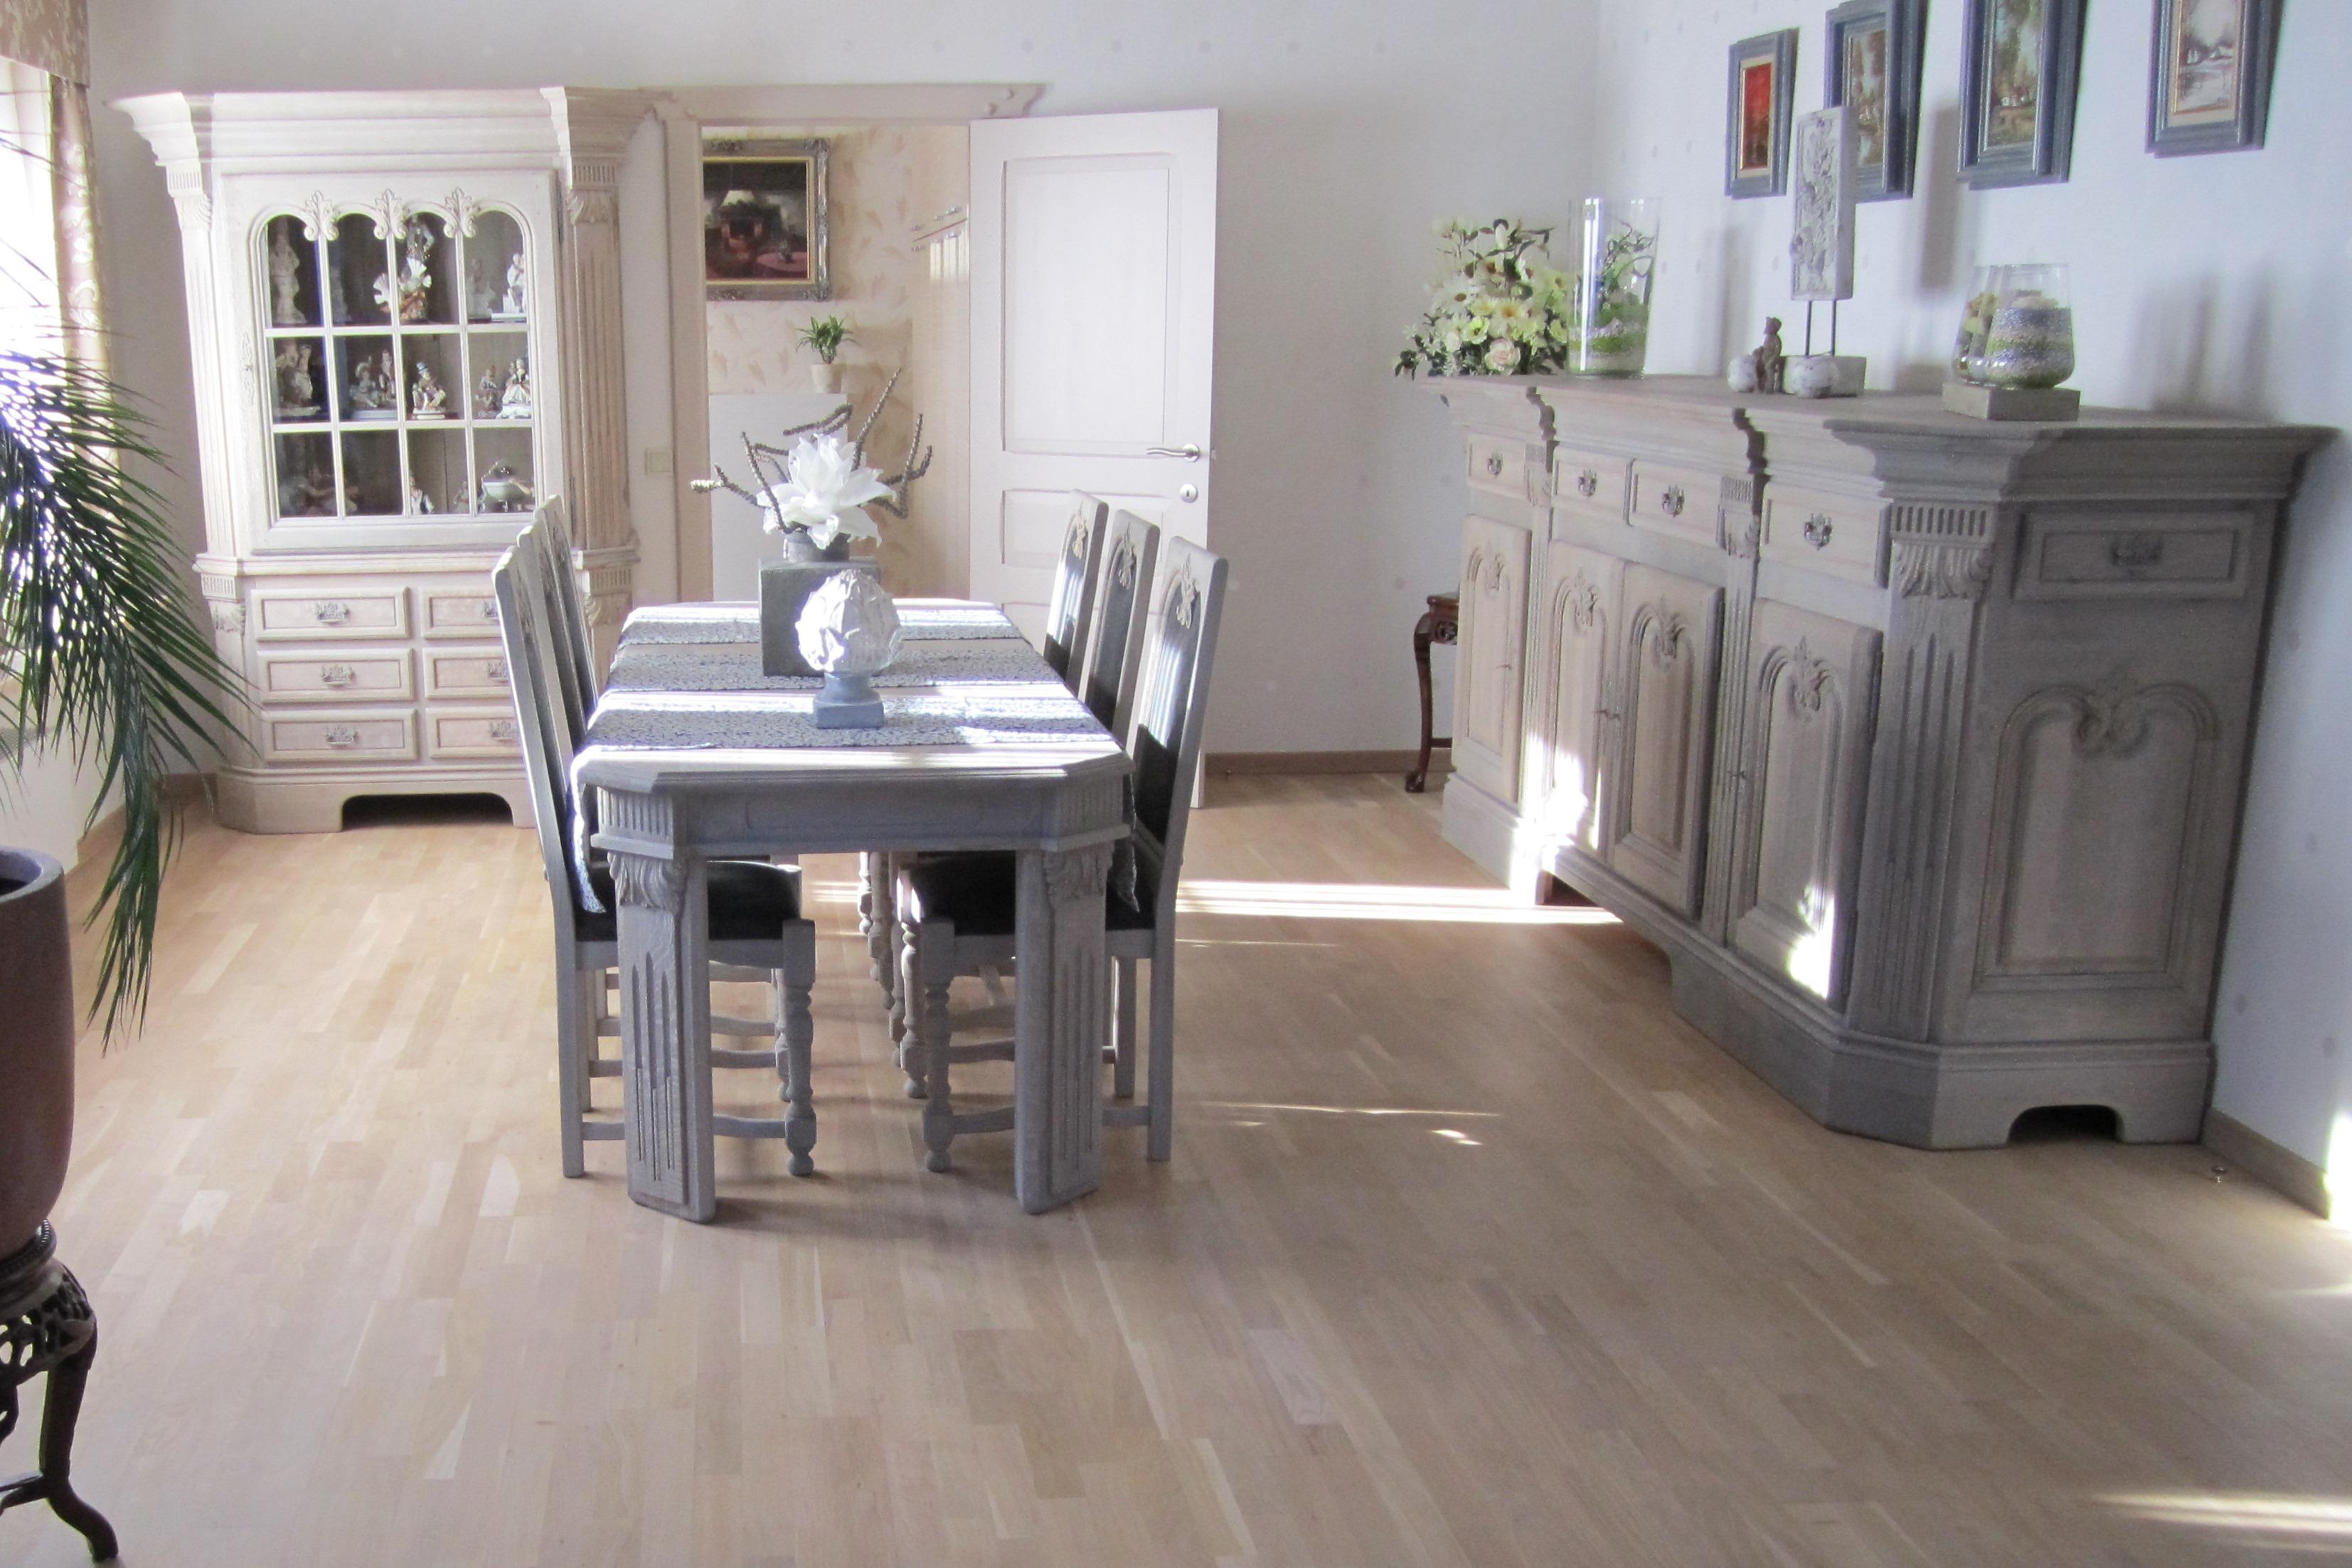 Houten tafel keuken. good houten keukengerei keuken houten tafel met